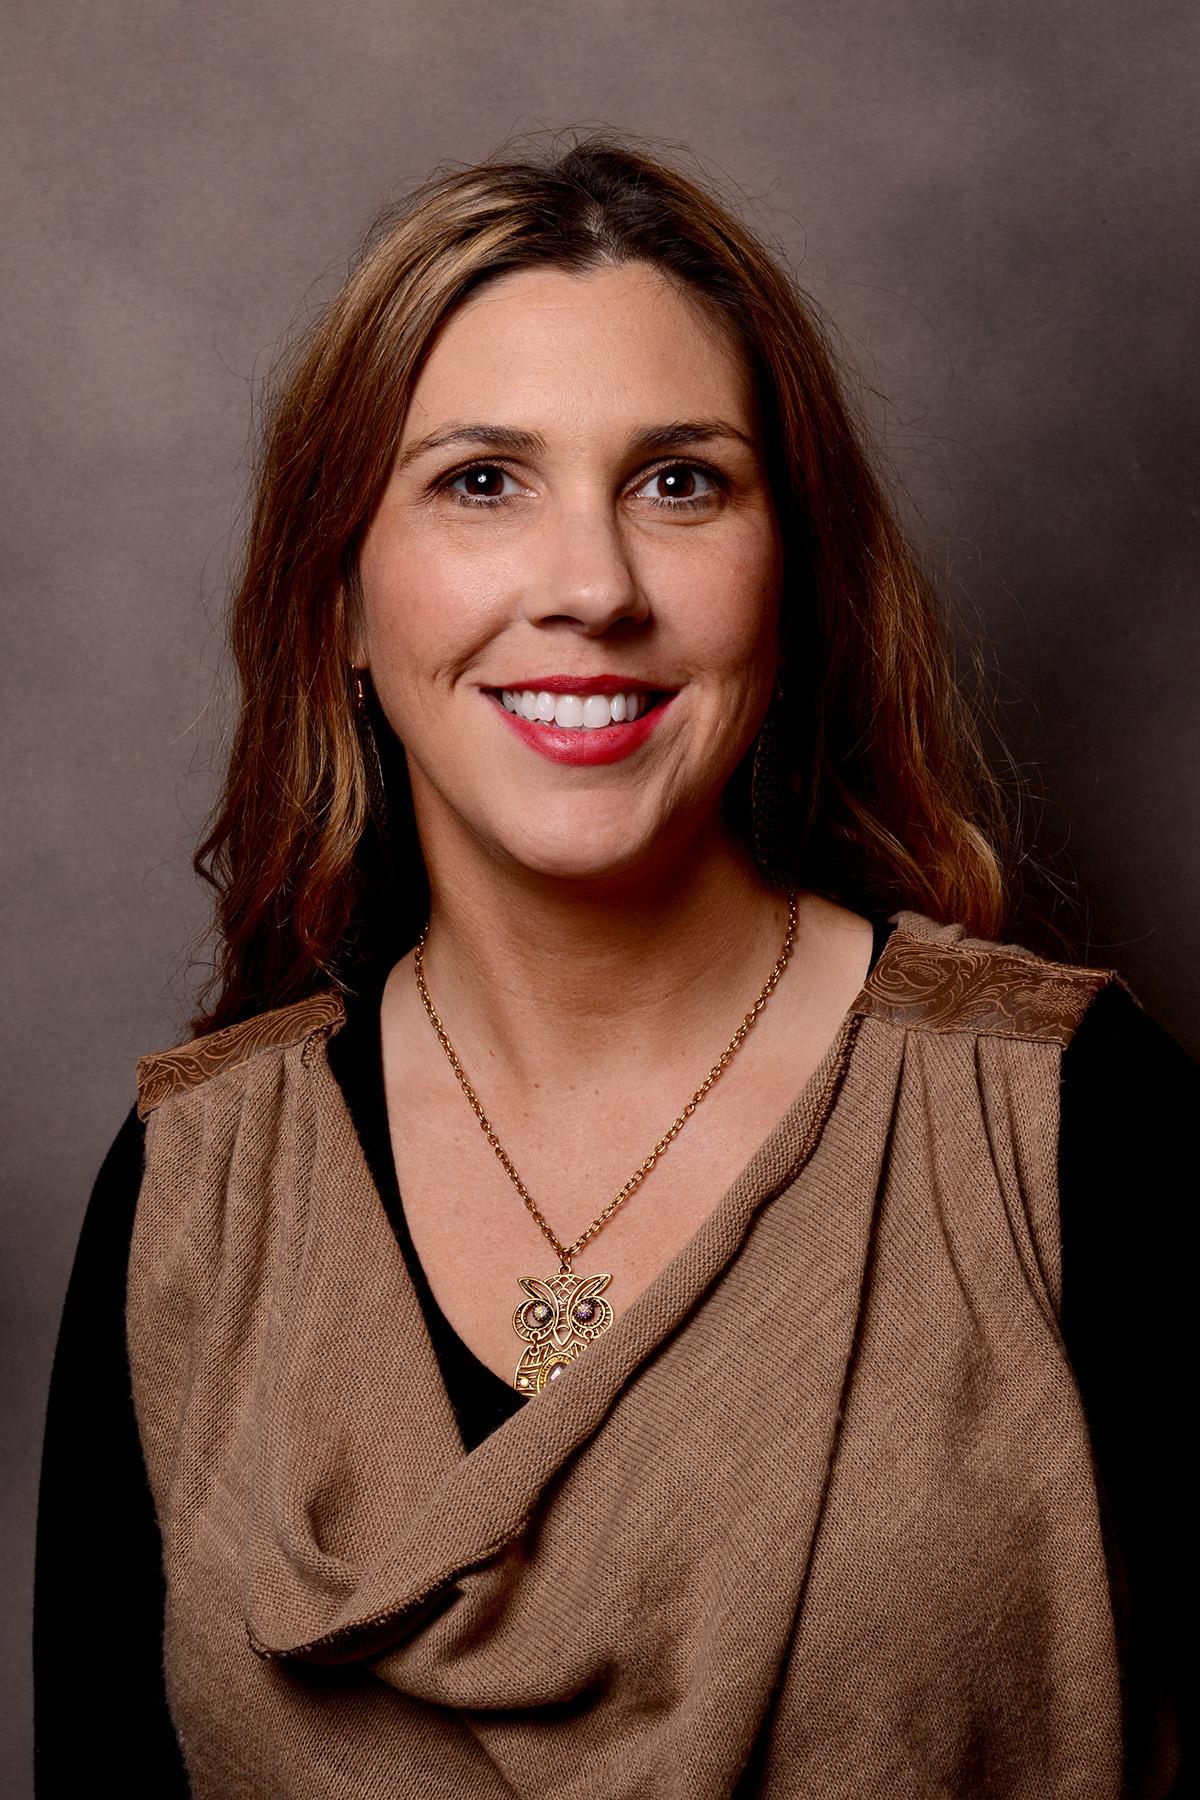 Amanda Wolfenden